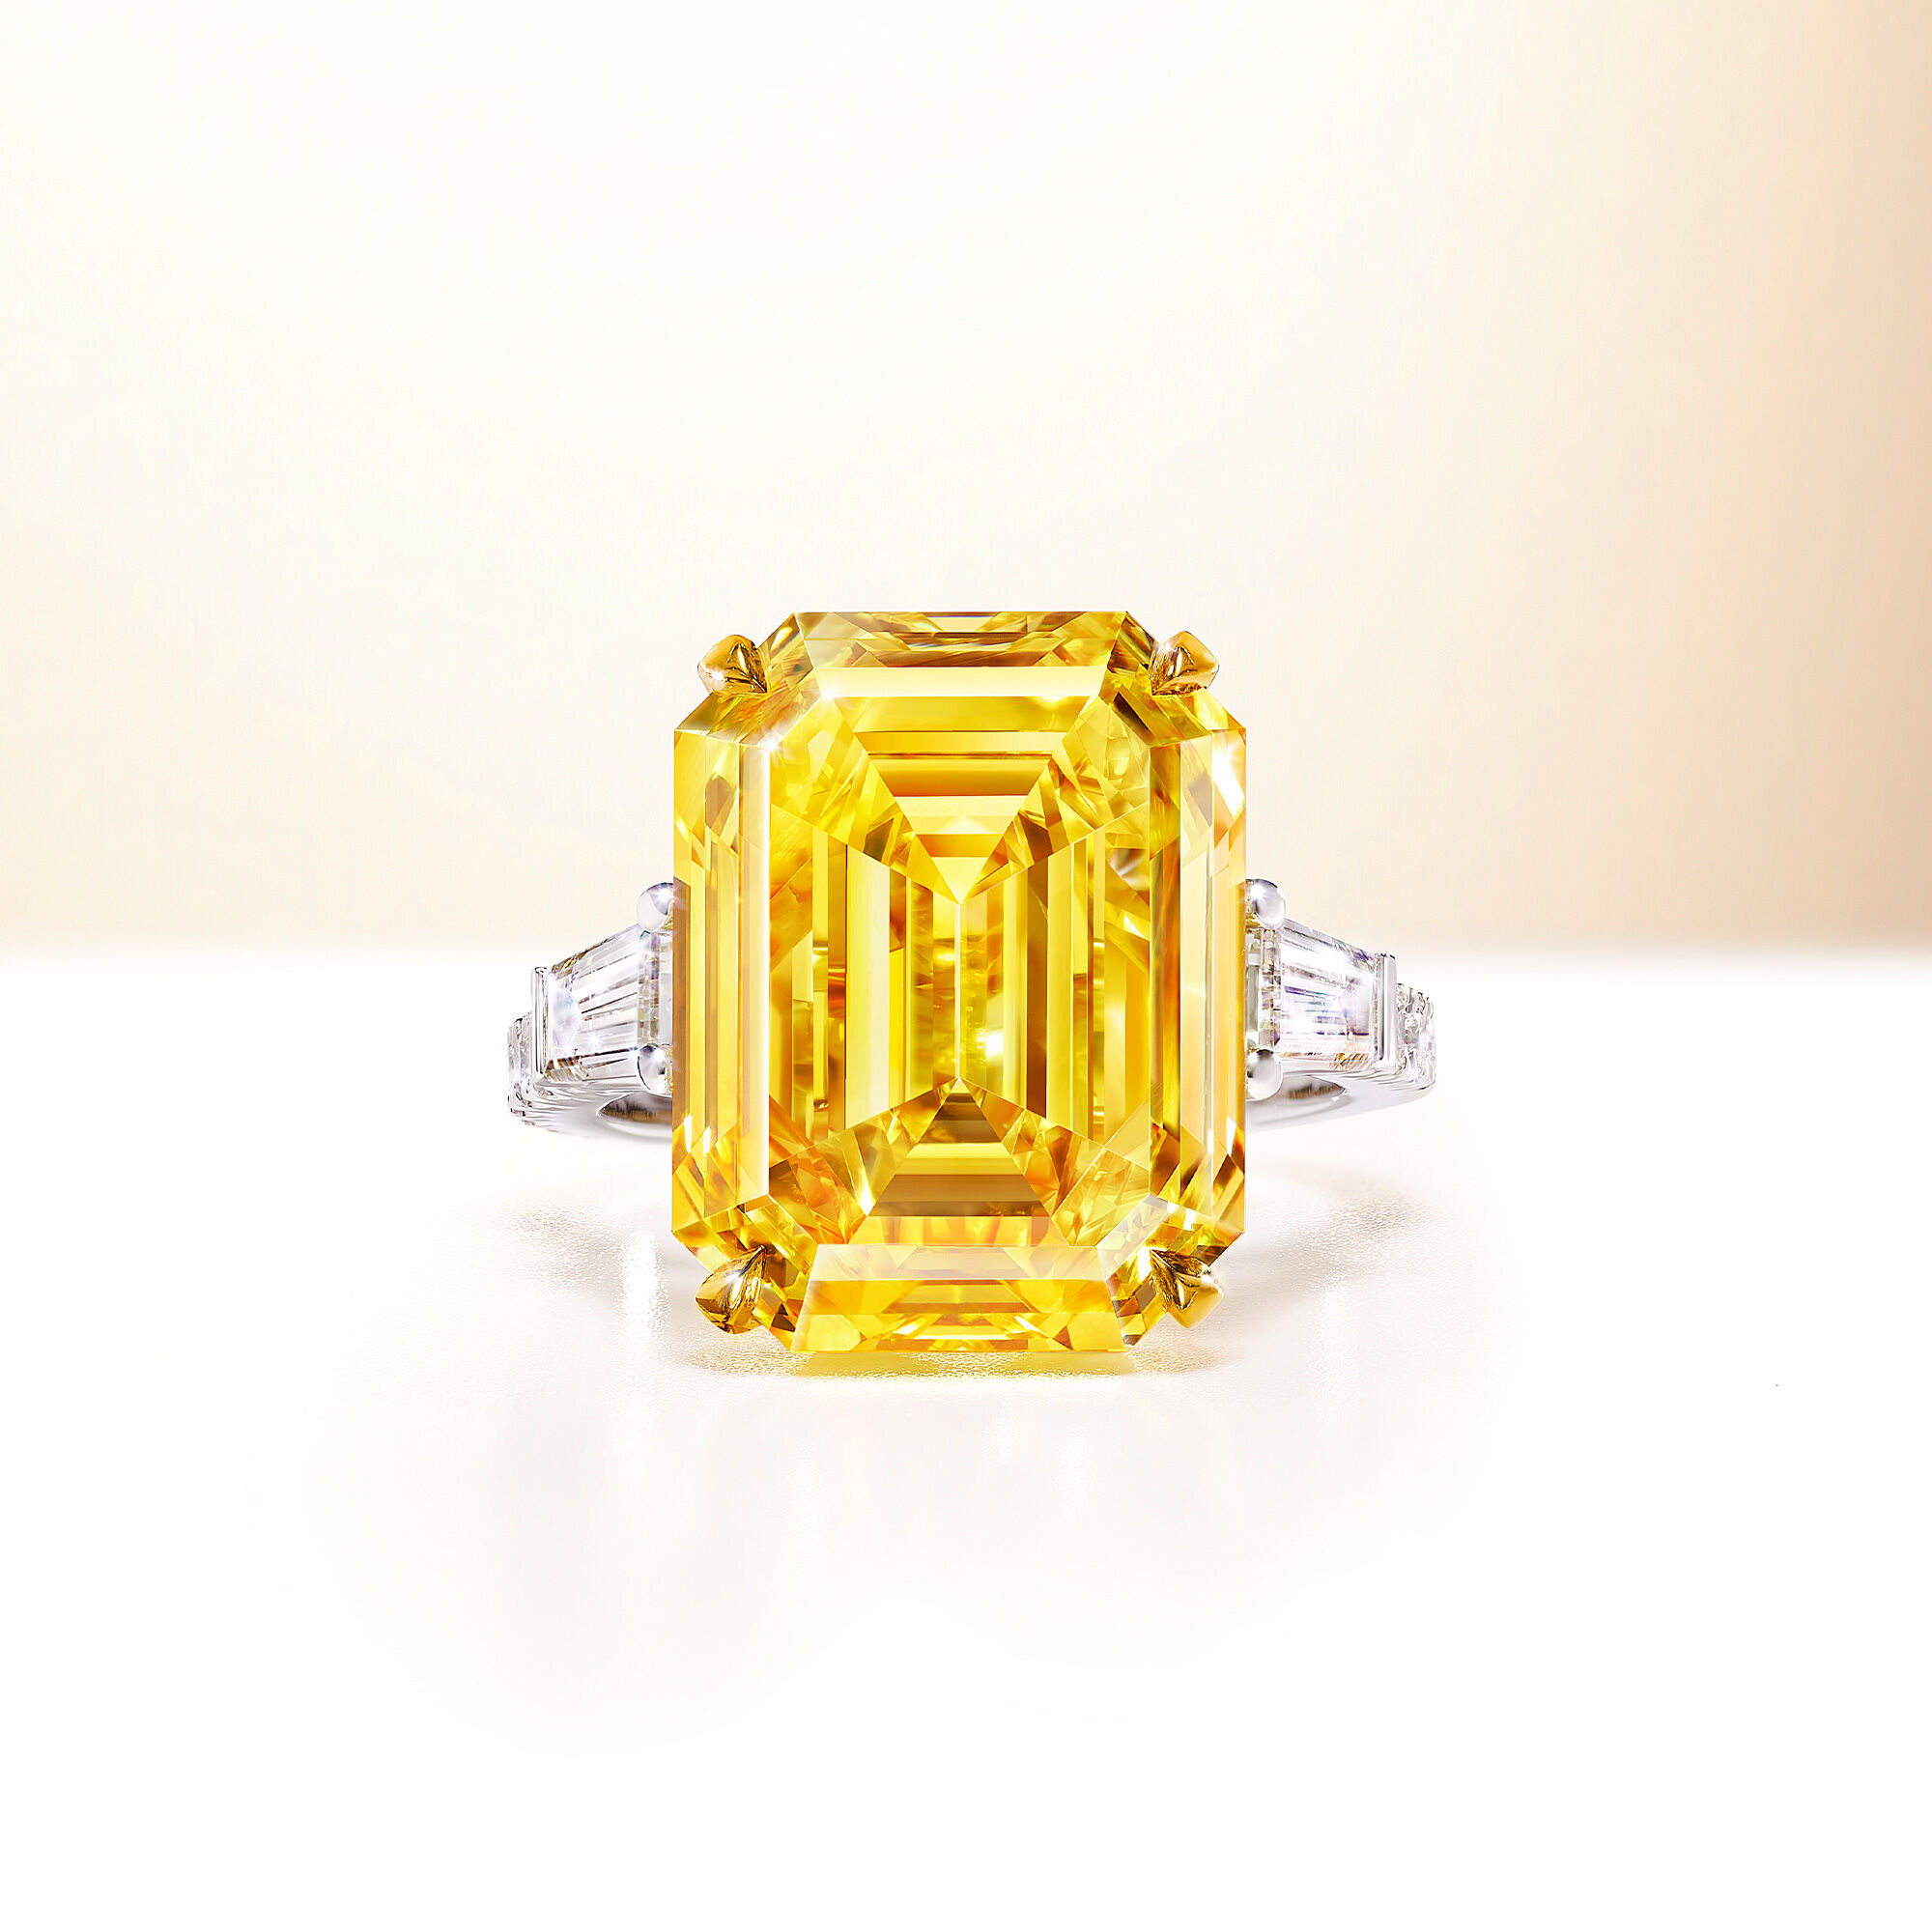 A 15.47 fancy vivid yellow emerald cut Graff diamond ring